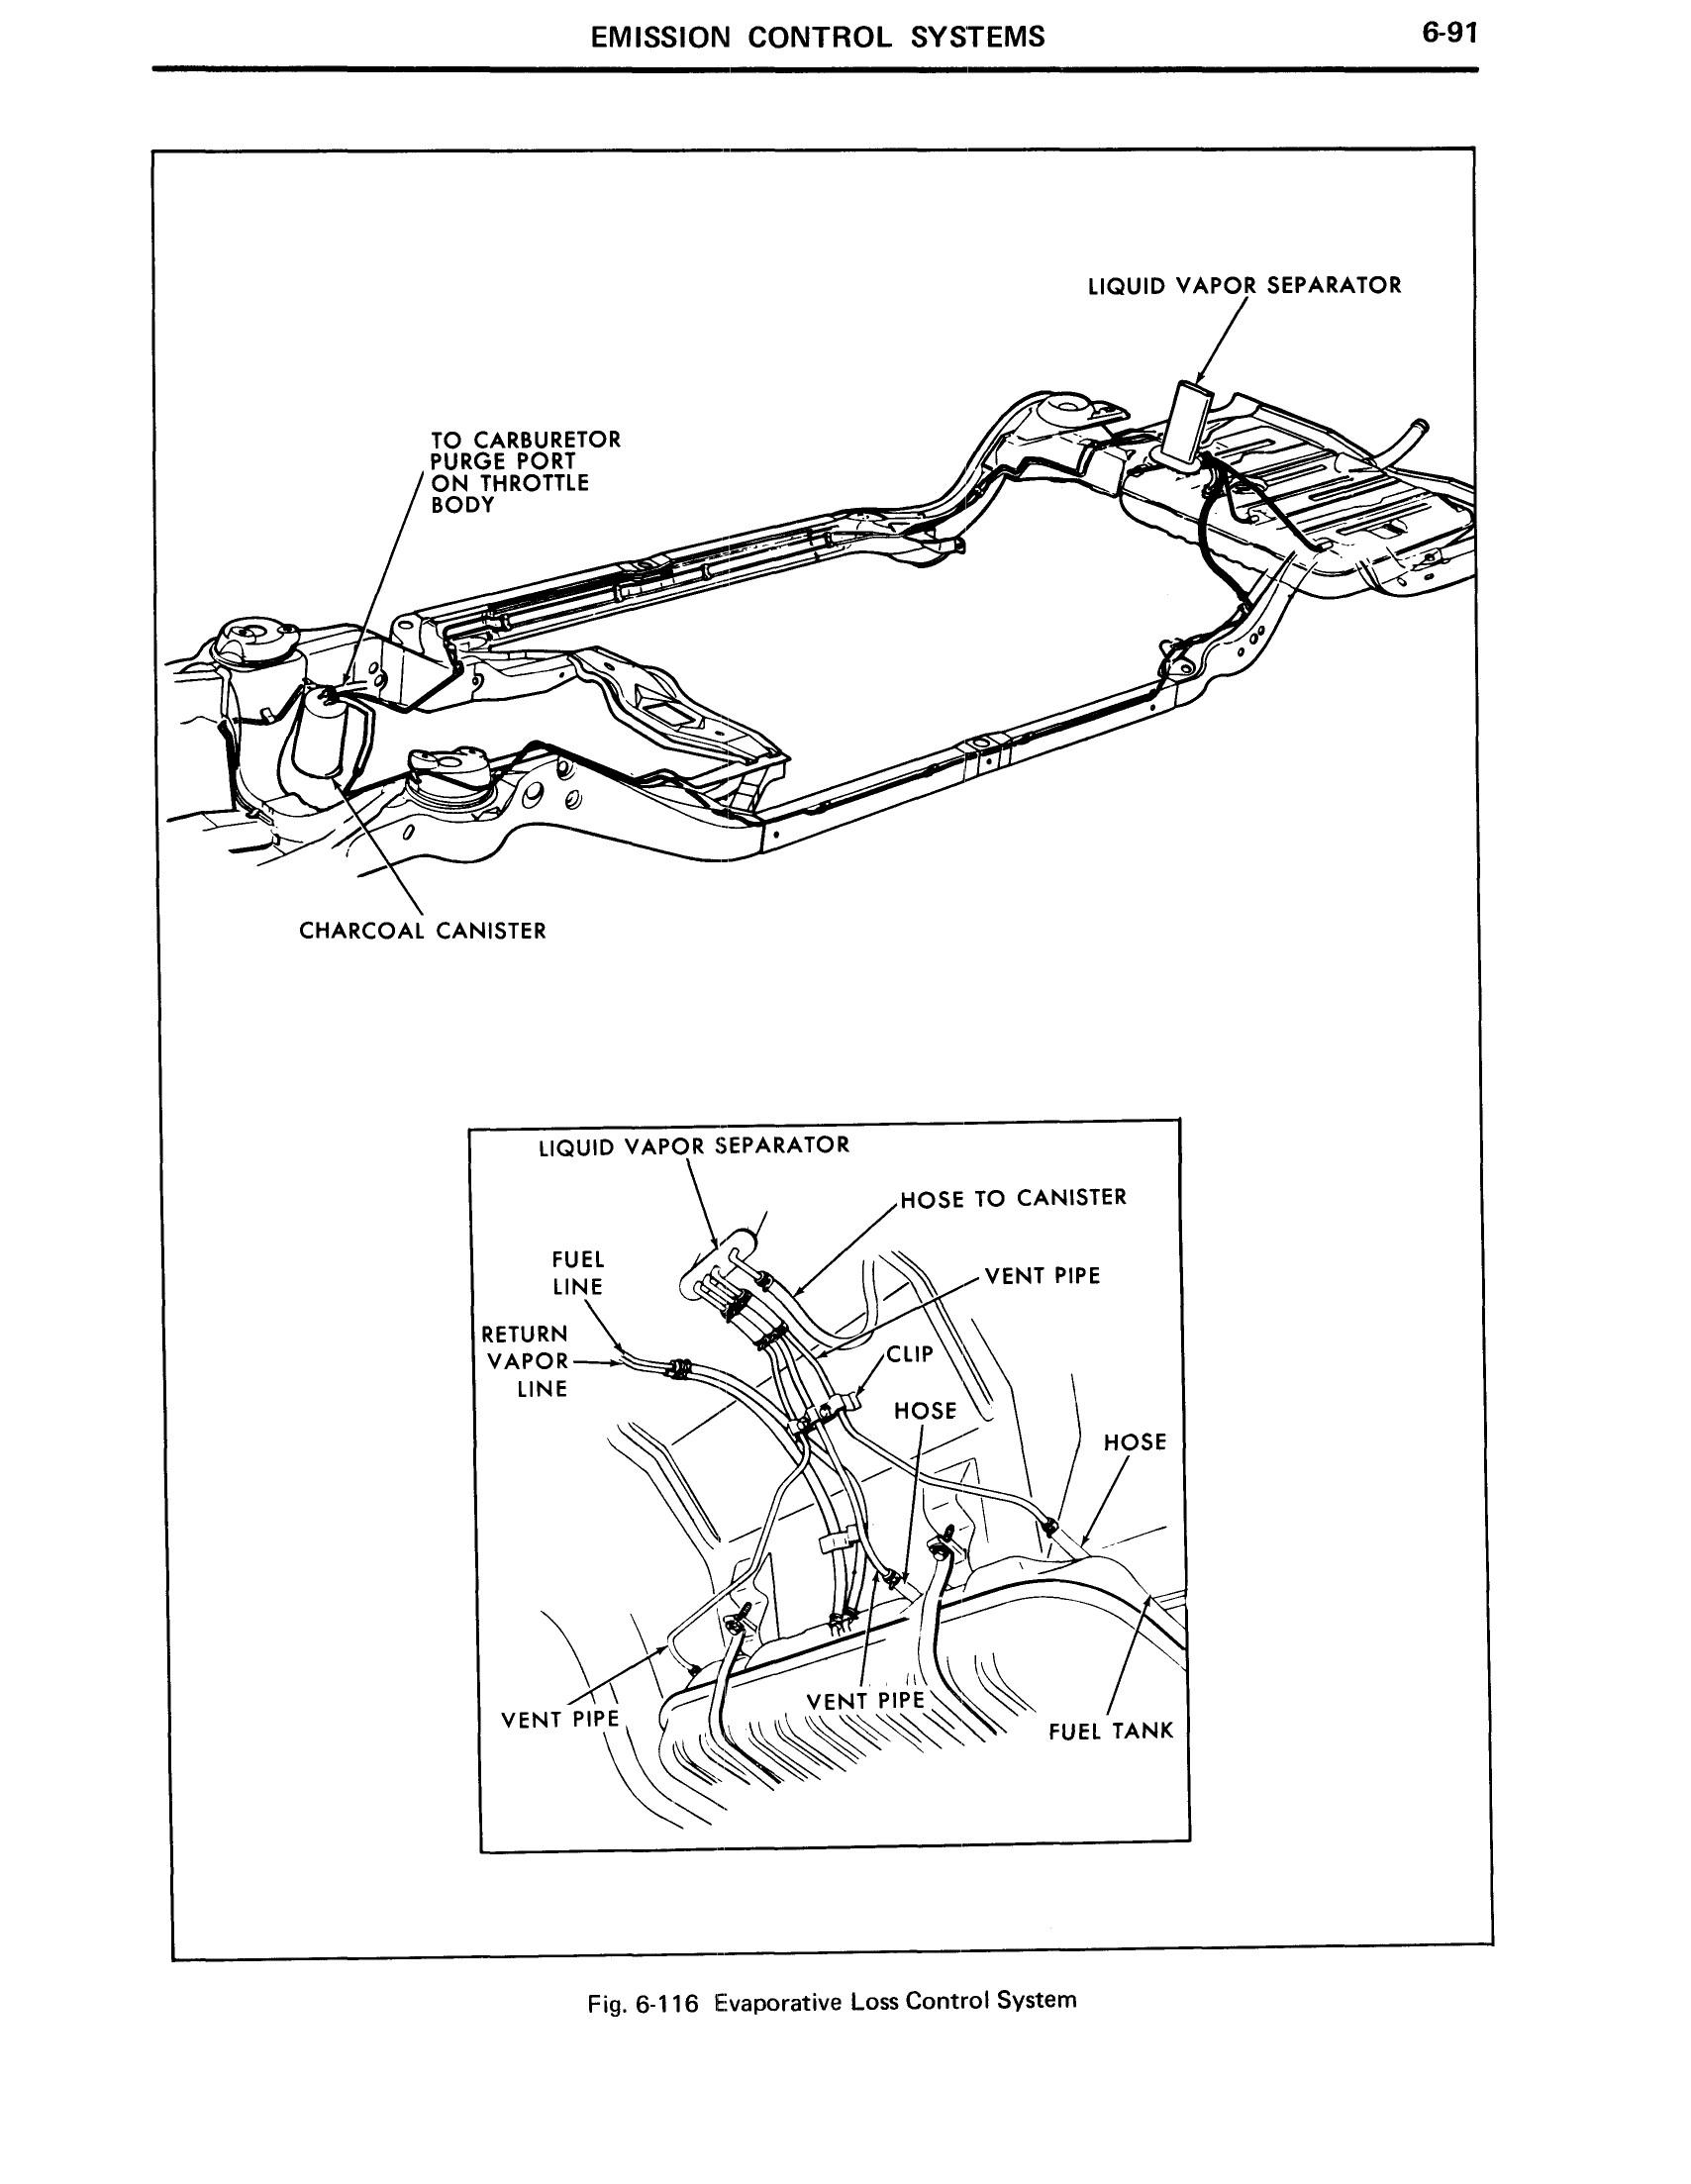 1971 Cadillac Shop Manual- Engine Page 91 of 128